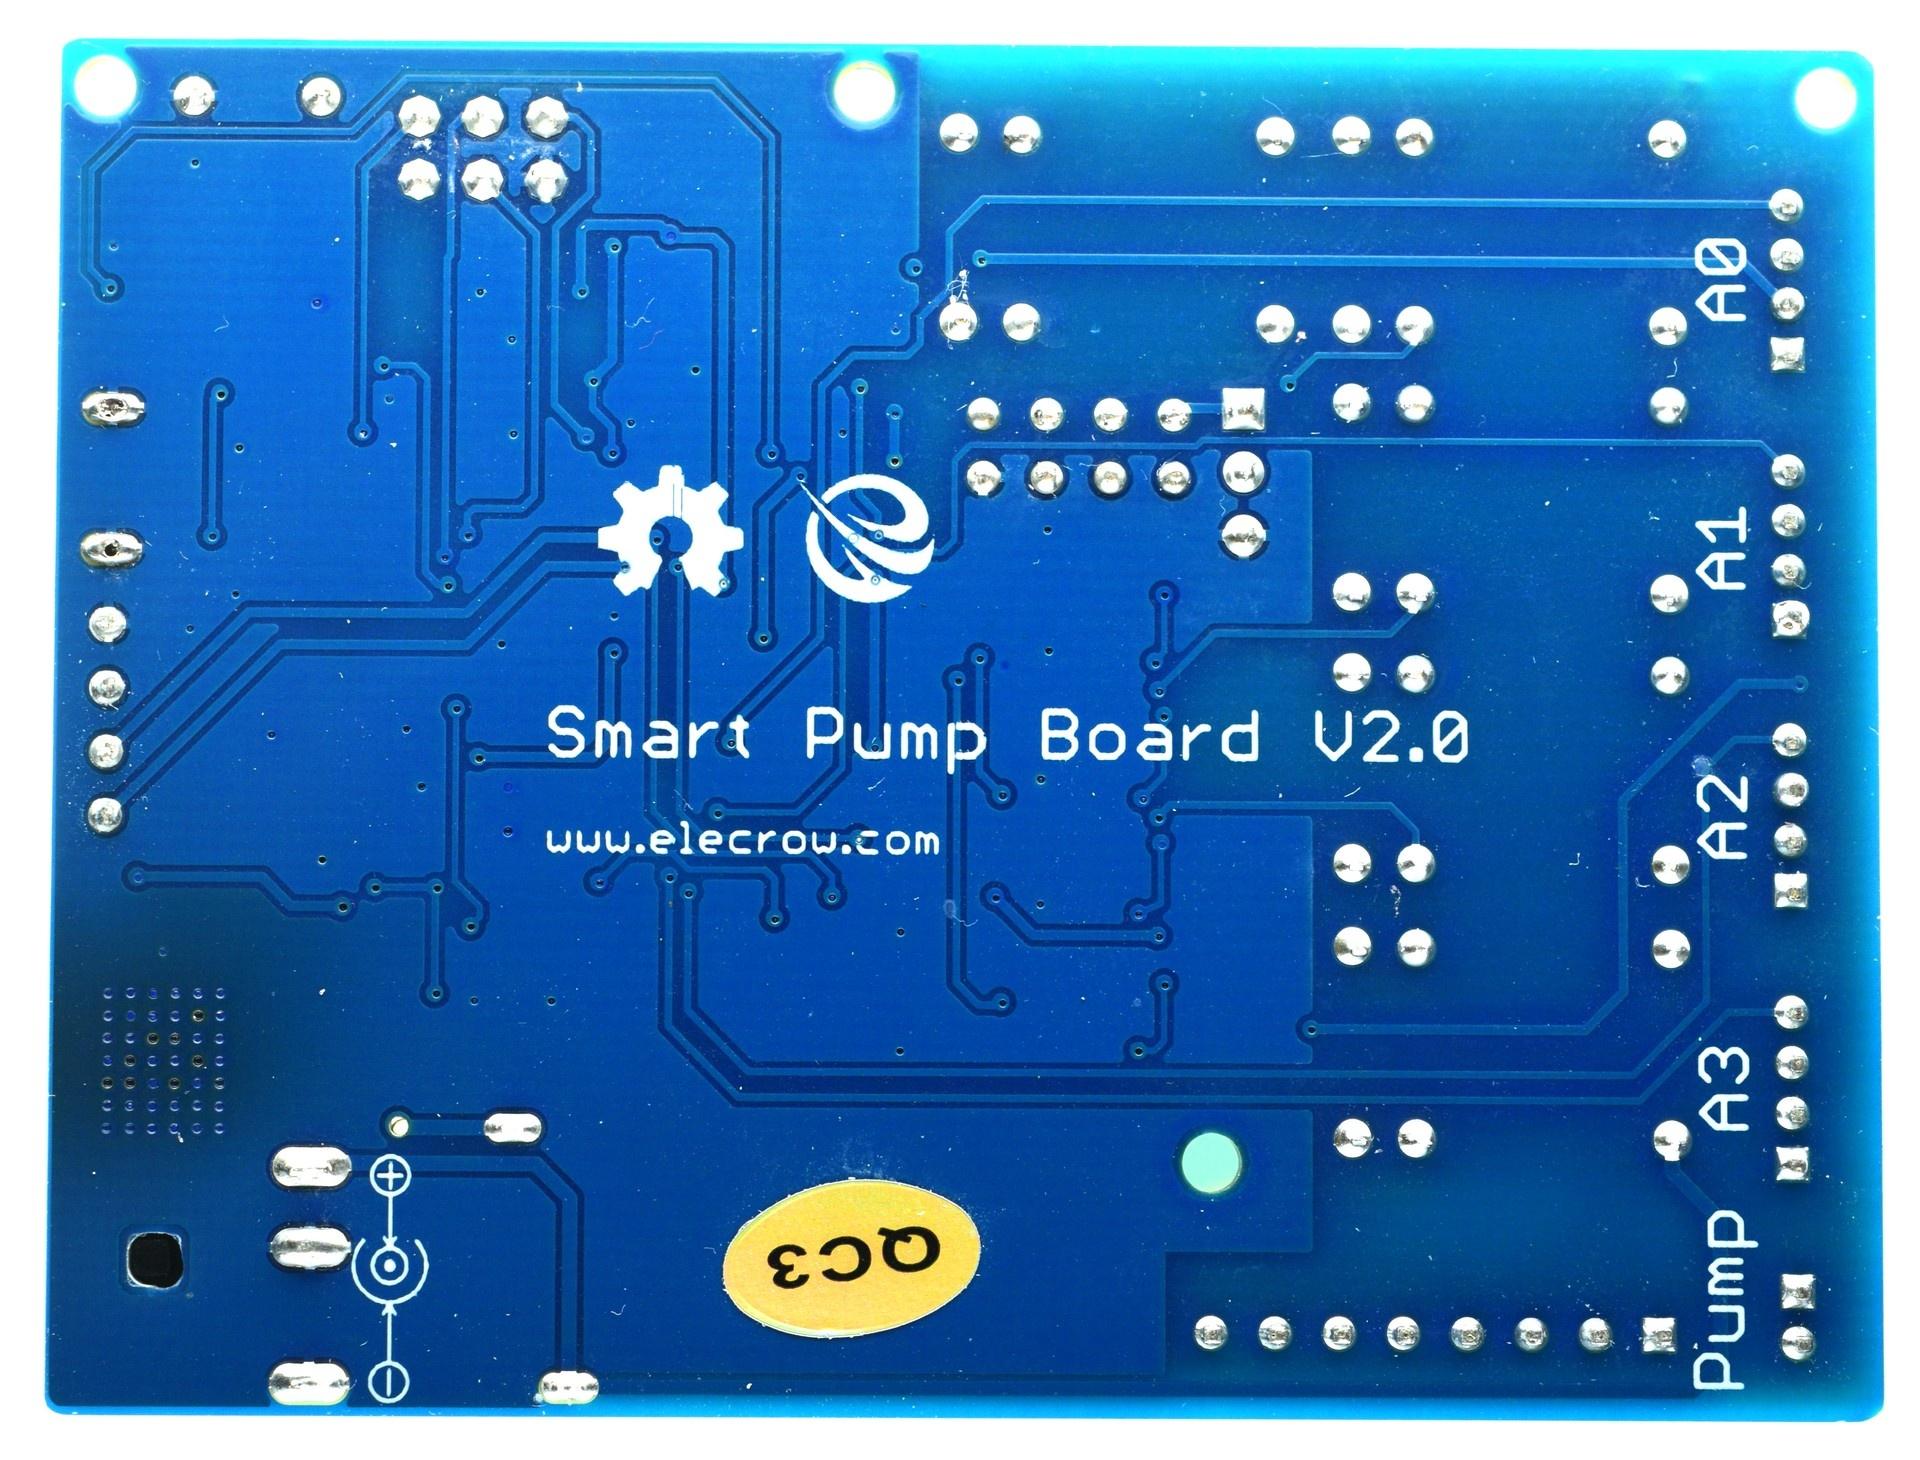 Arduino Automatic Smart Plant Watering Kit 2 0 - Arduino - WIKI